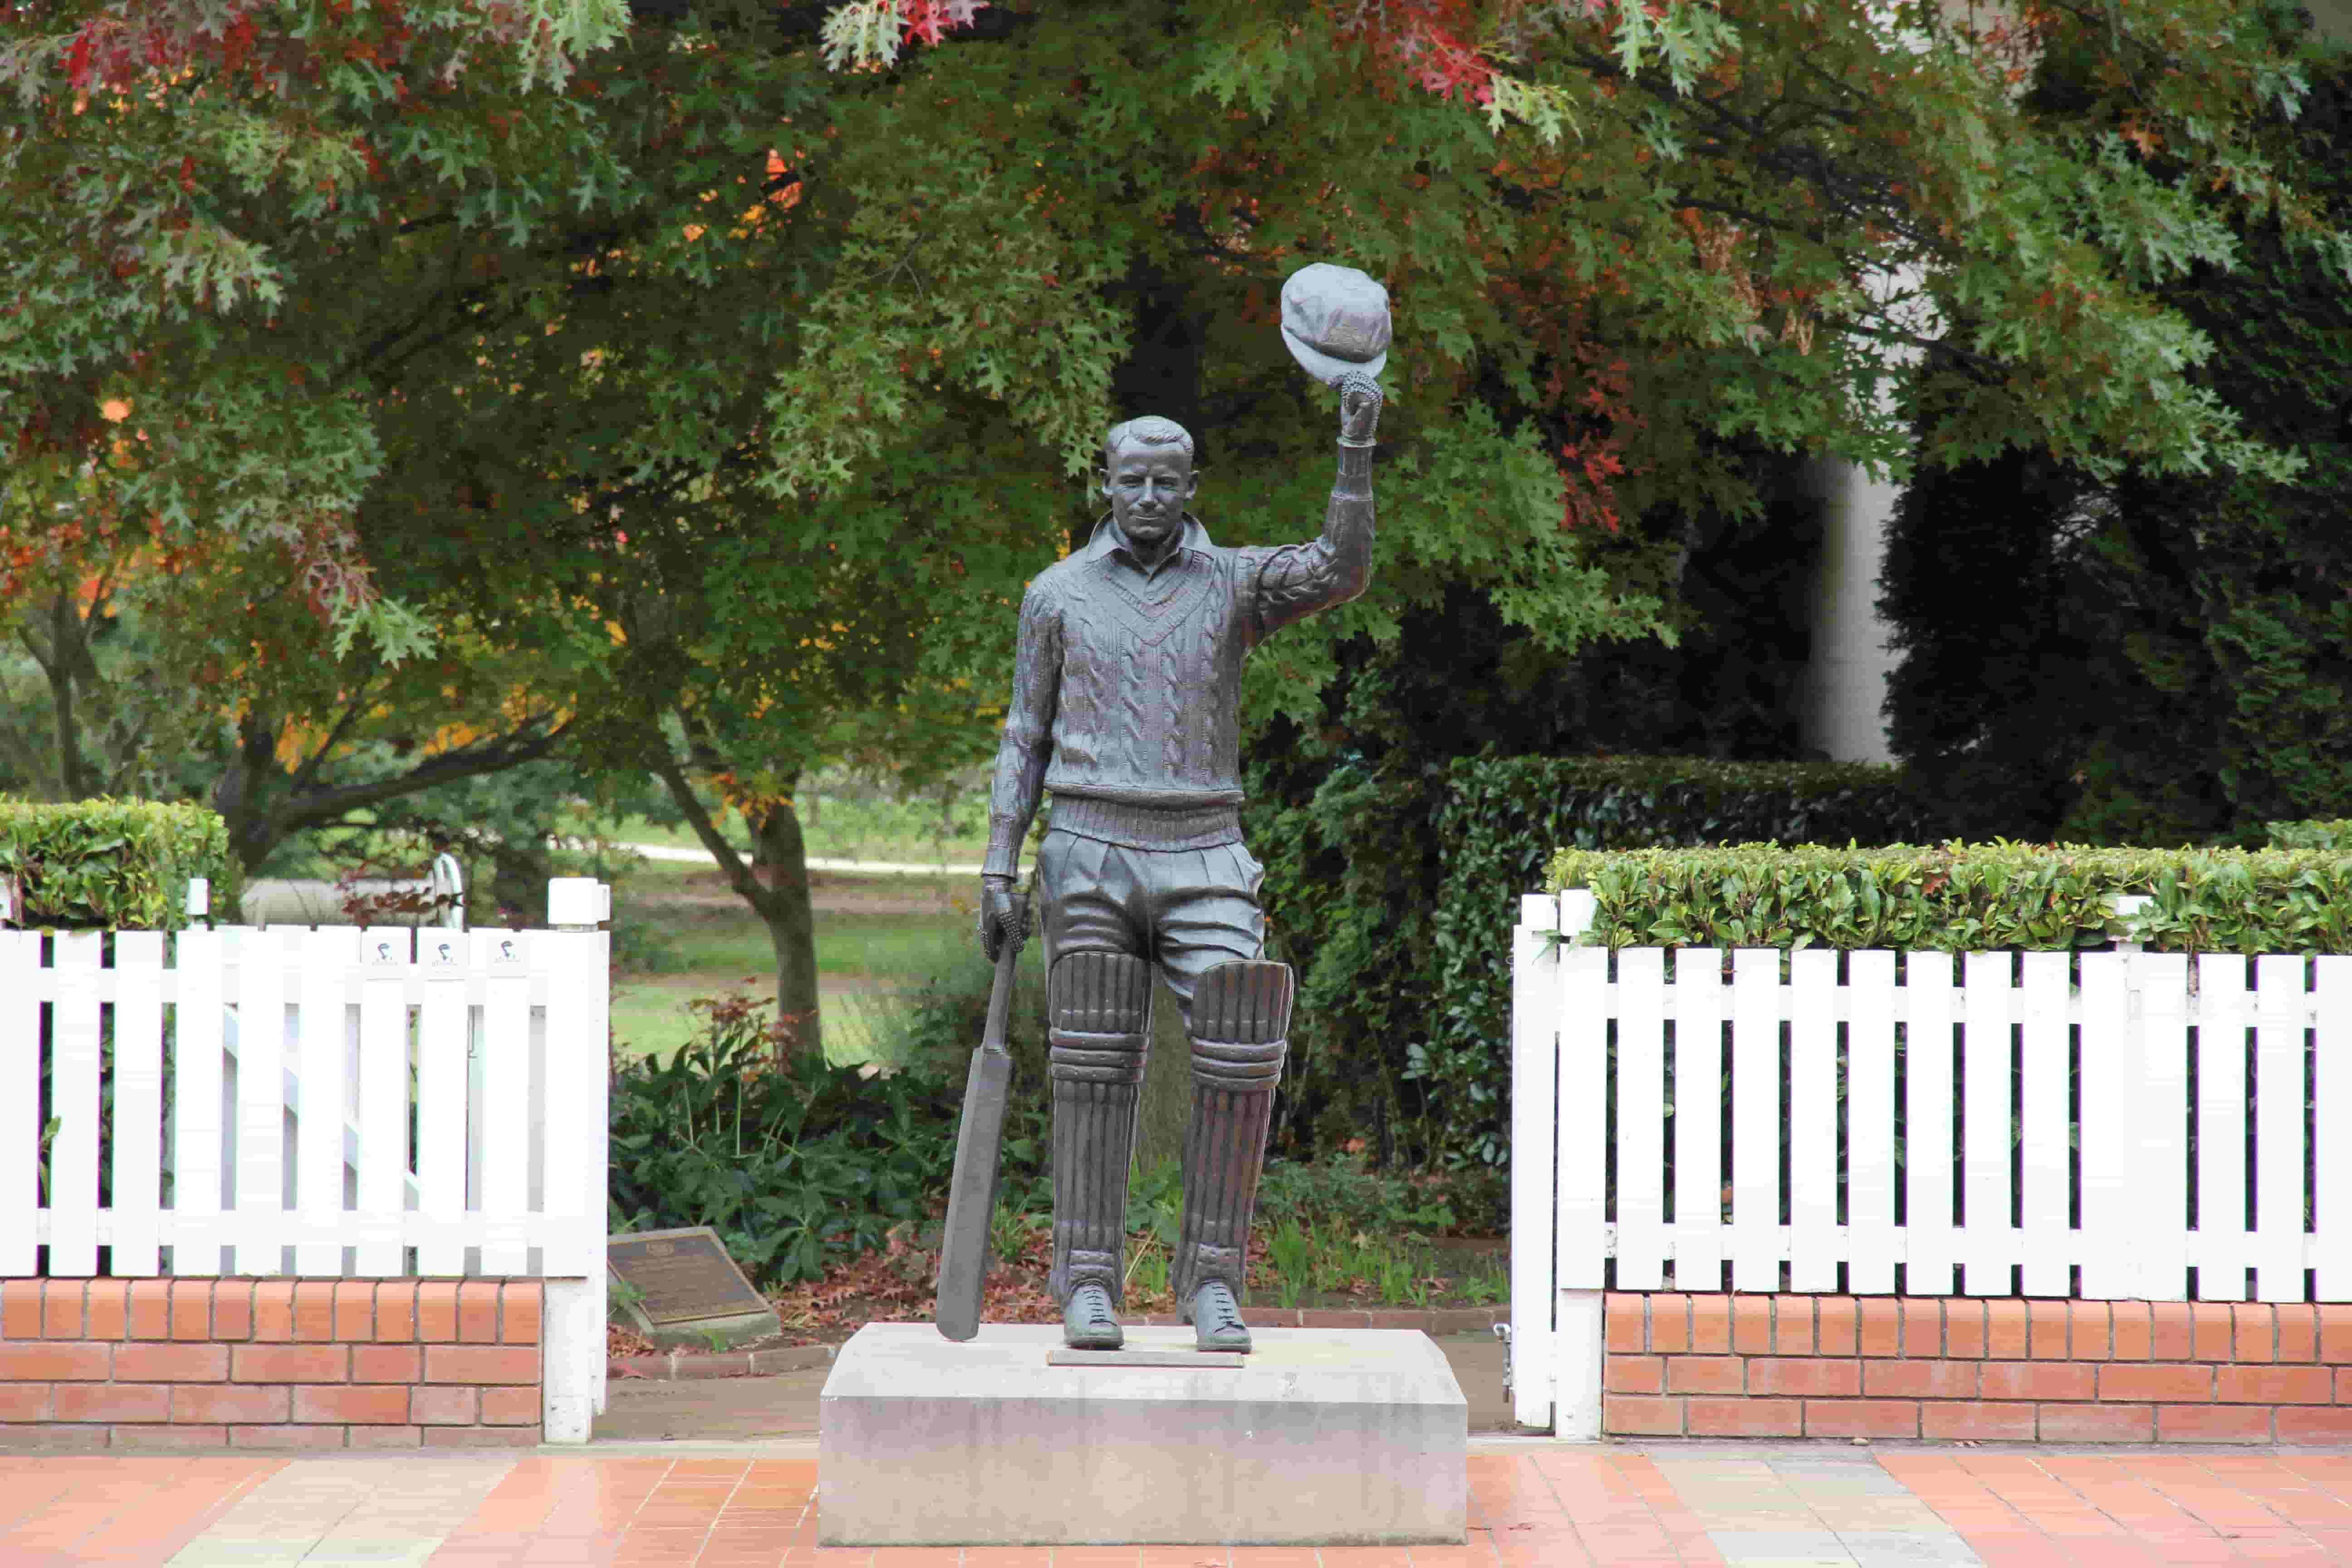 Statue Of Don Bradman